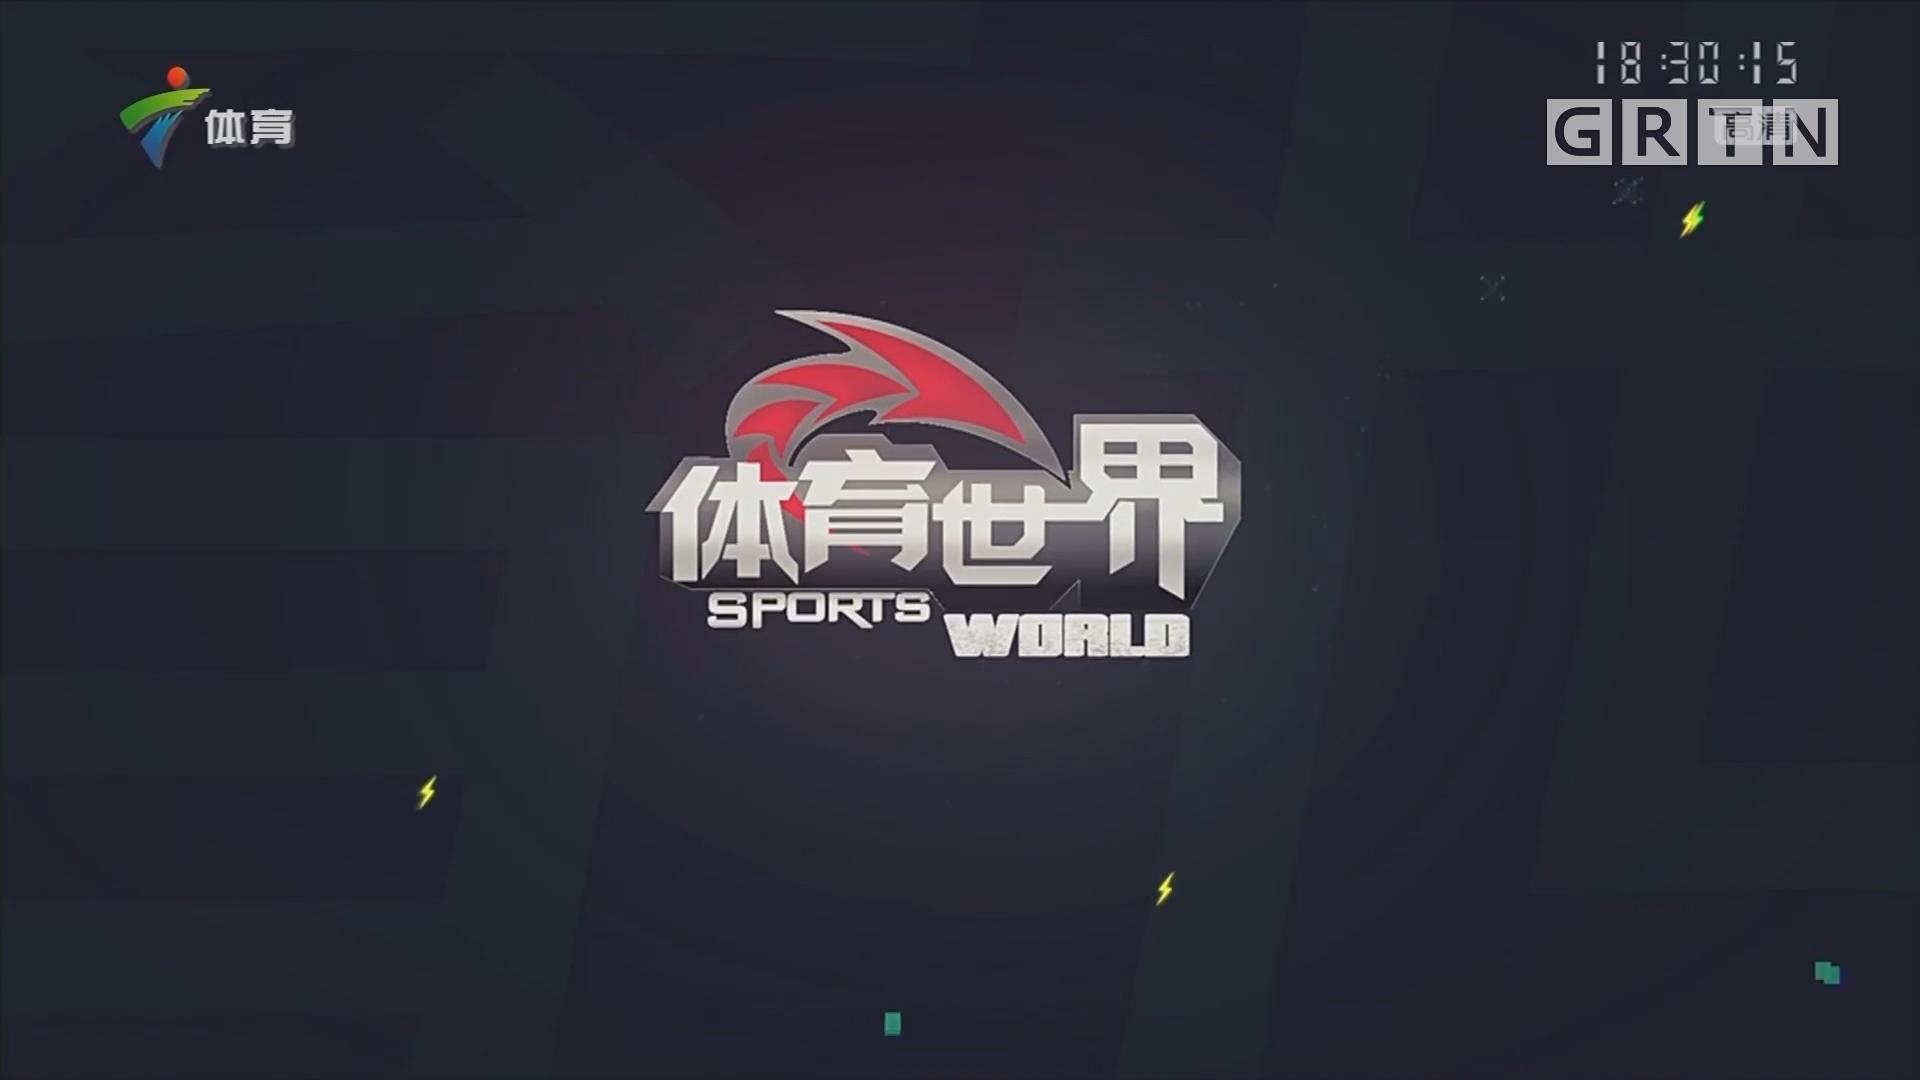 [HD][2018-11-30]体育世界:室内五人制国际锦标赛开战 中国队惜败墨西哥队